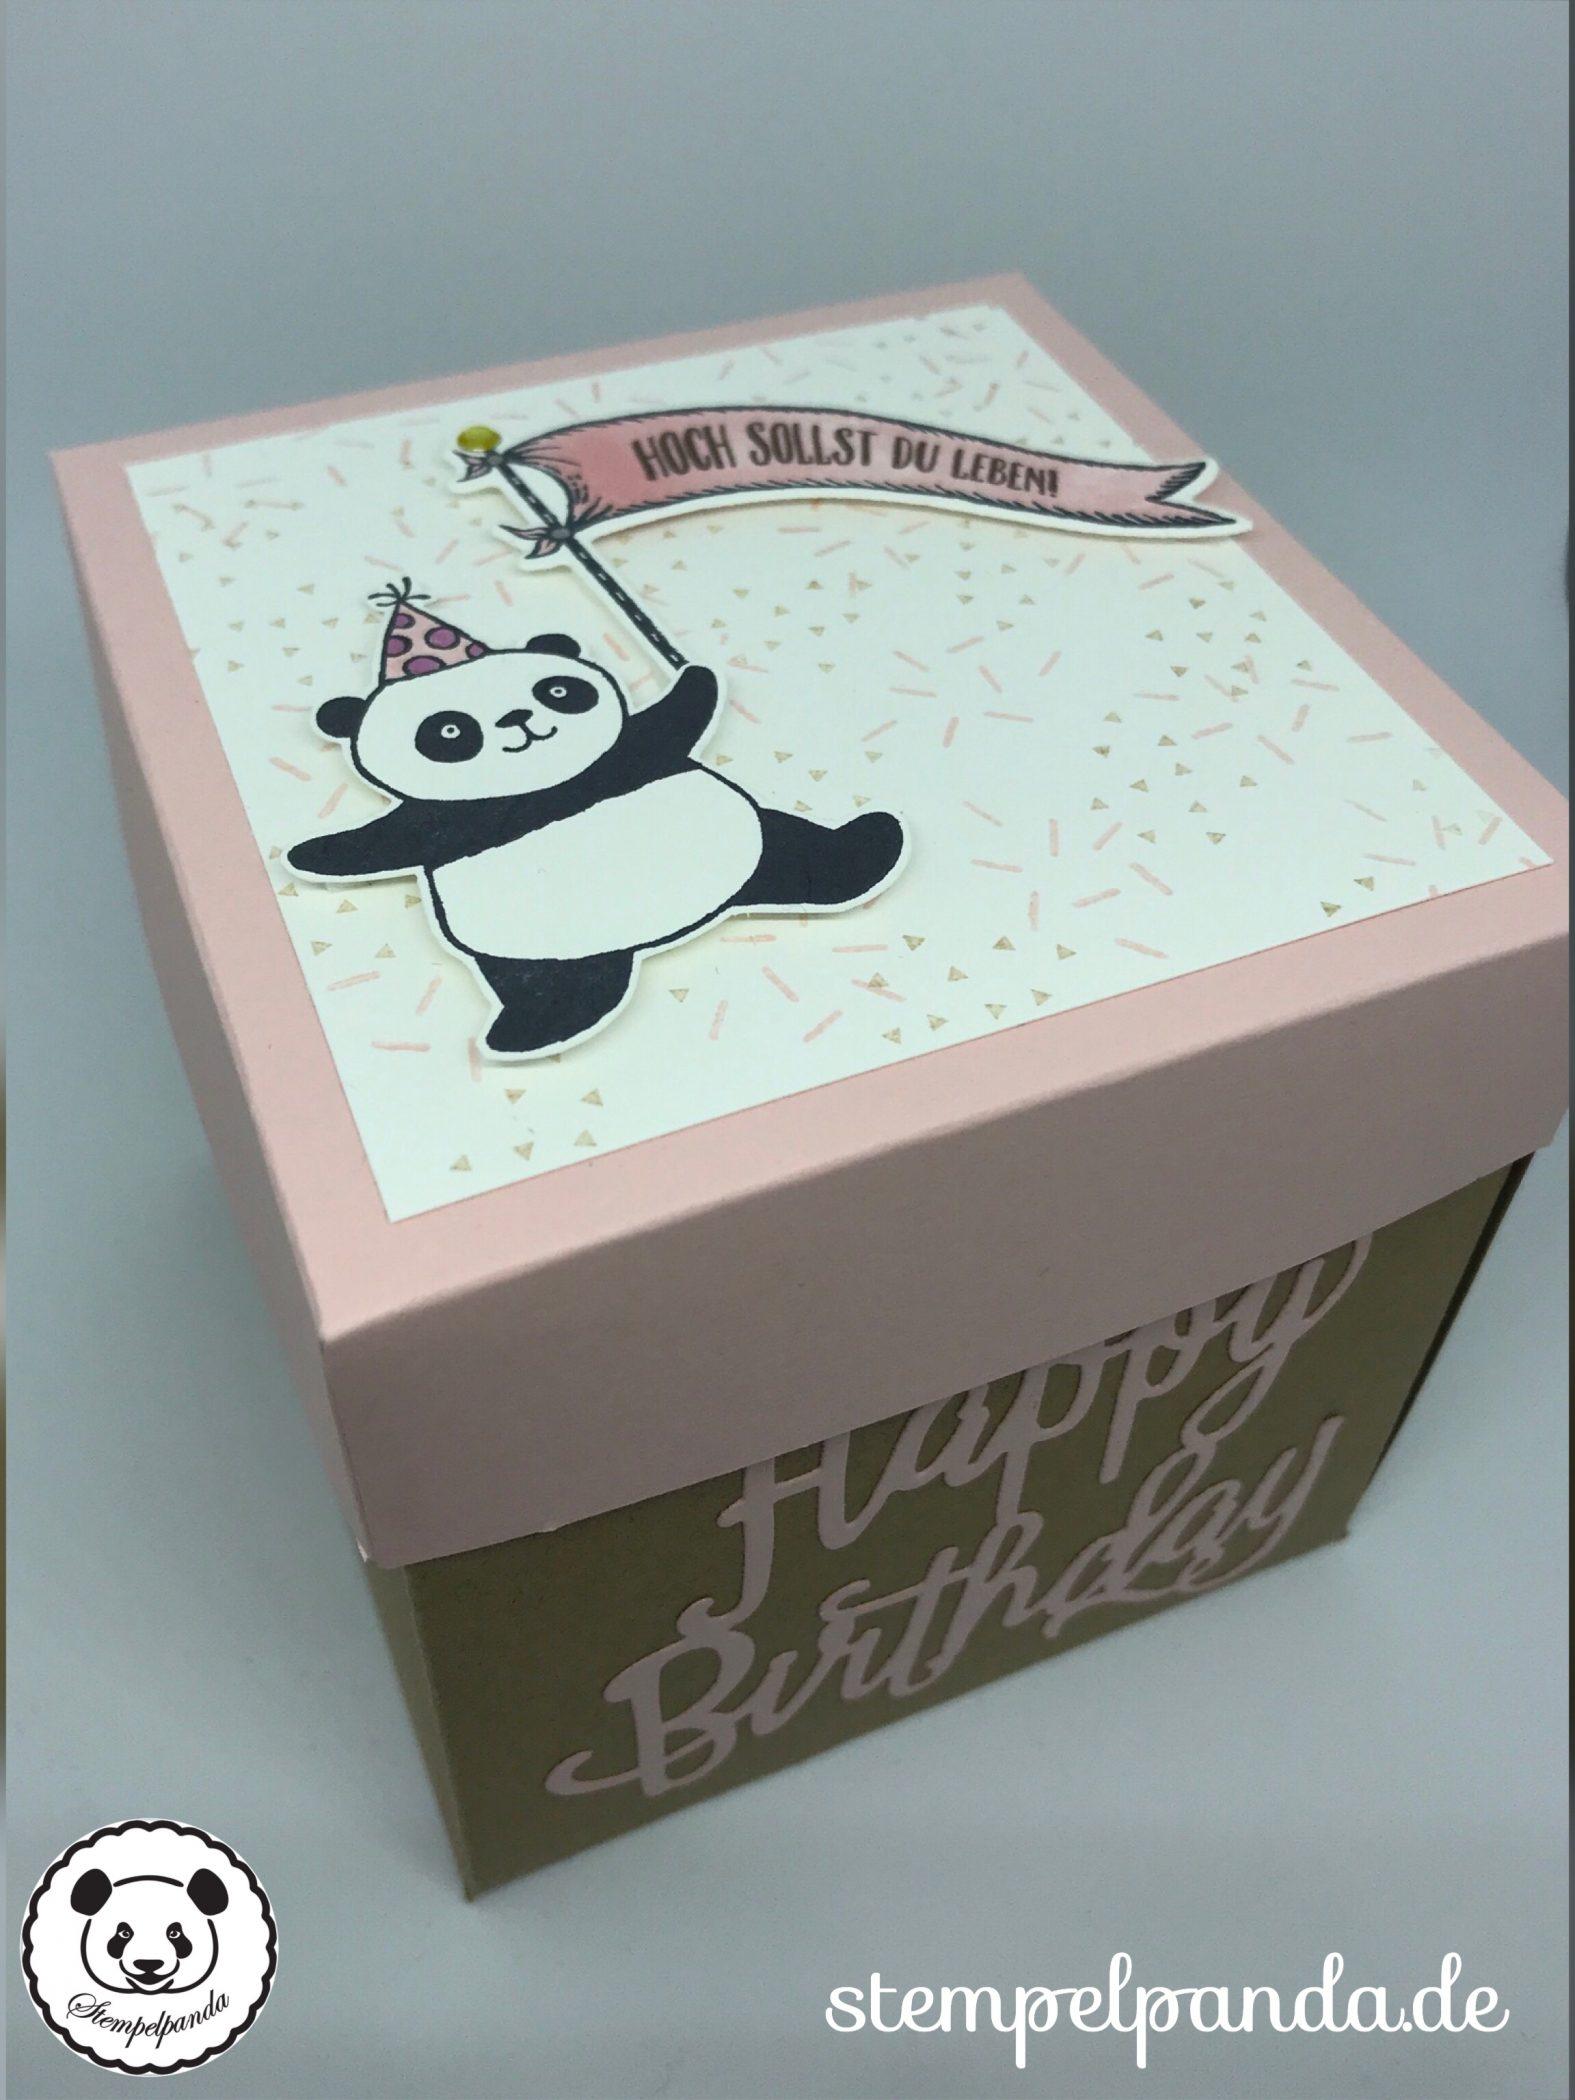 Stempelpanda, Stampin Up, SU, Explosionsbox, Geburtstag, Birthday ...